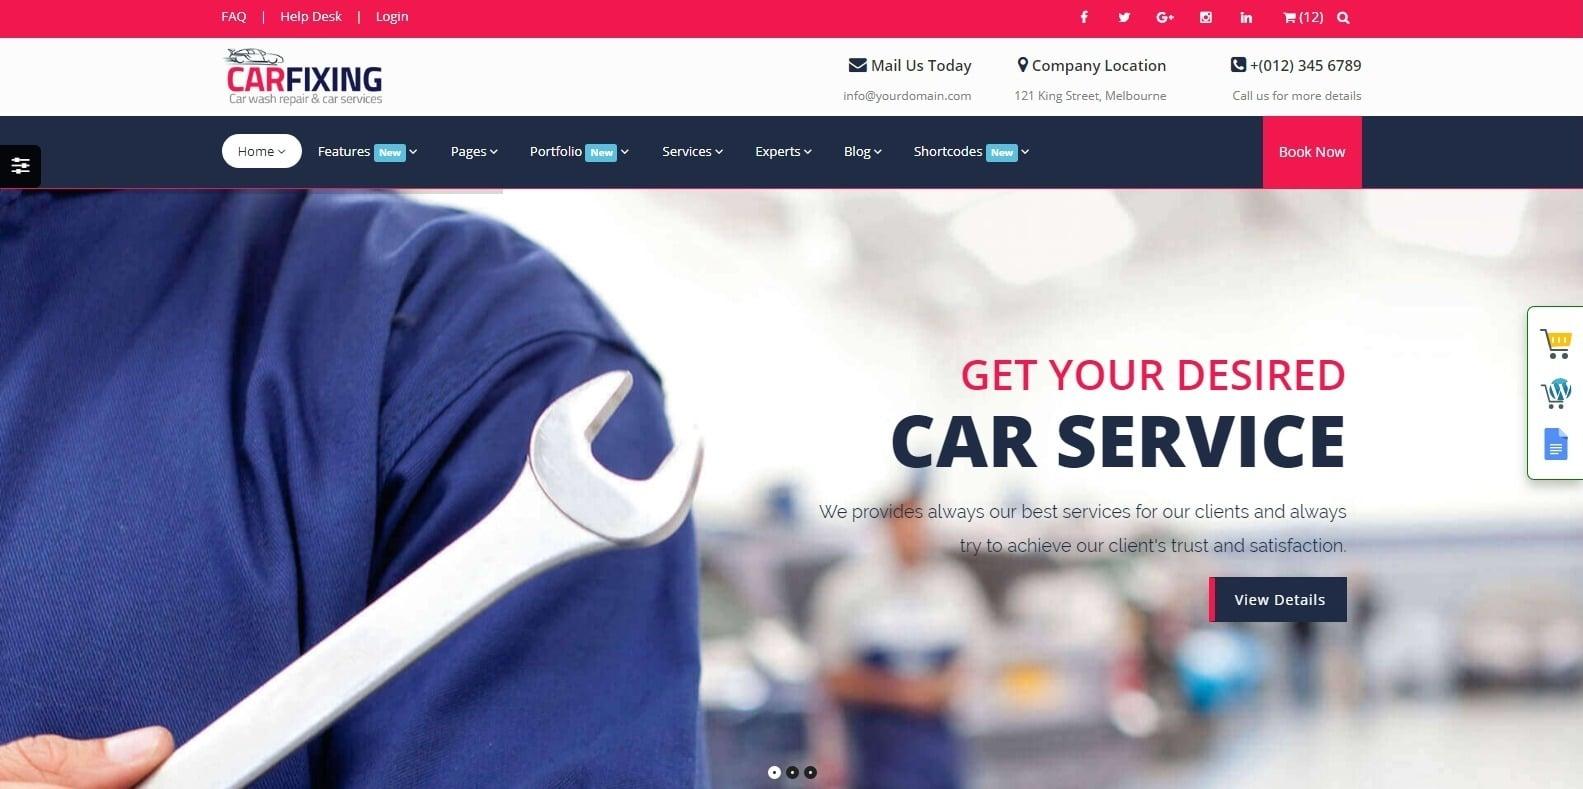 carfixing-automotive-website-template